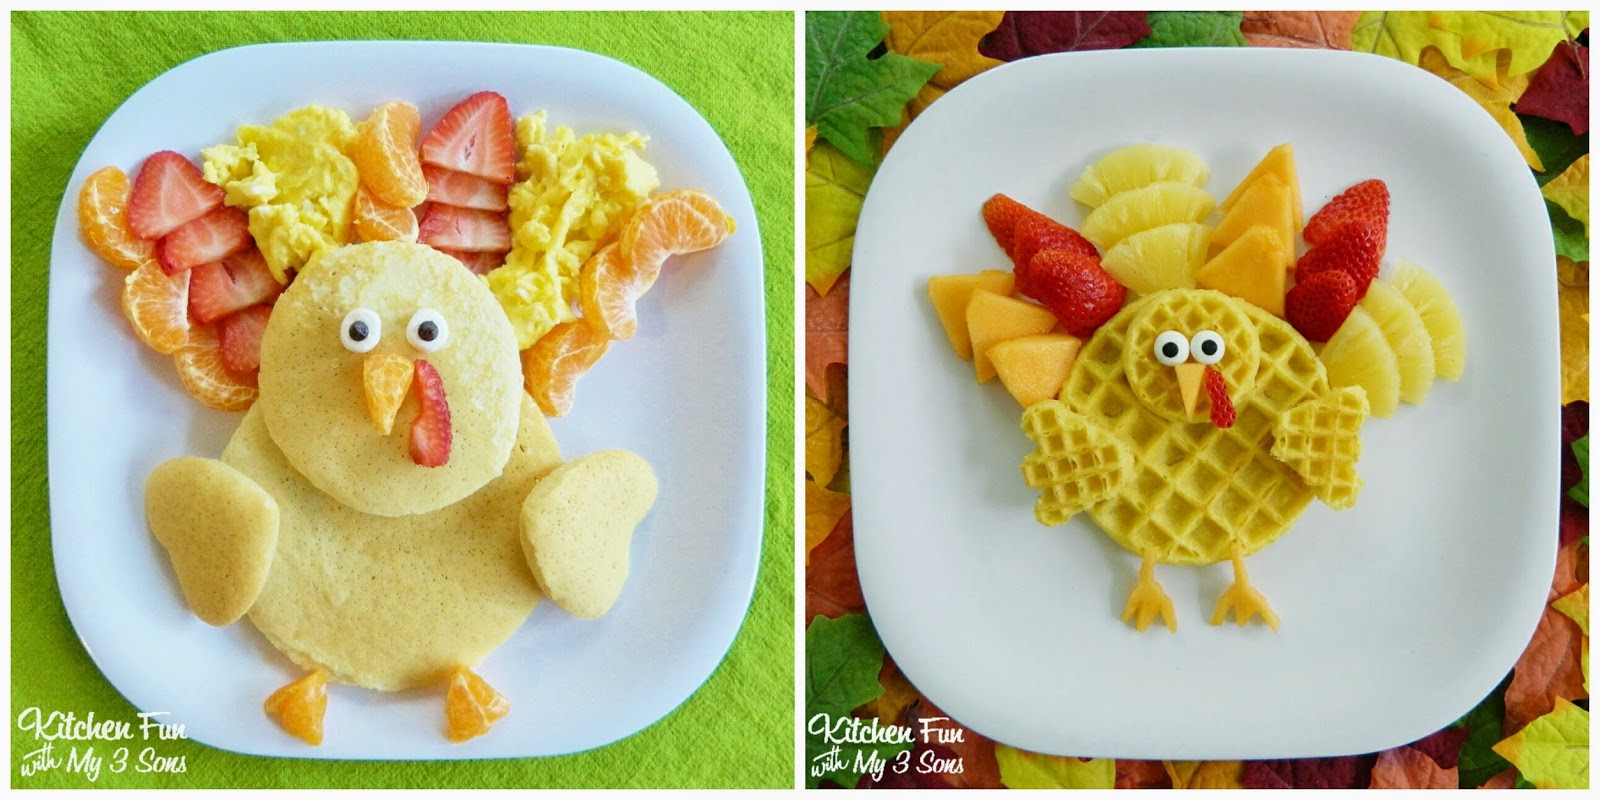 Thanksgiving Breakfast Menus  Thanksgiving Turkey Pancakes for Breakfast Kitchen Fun